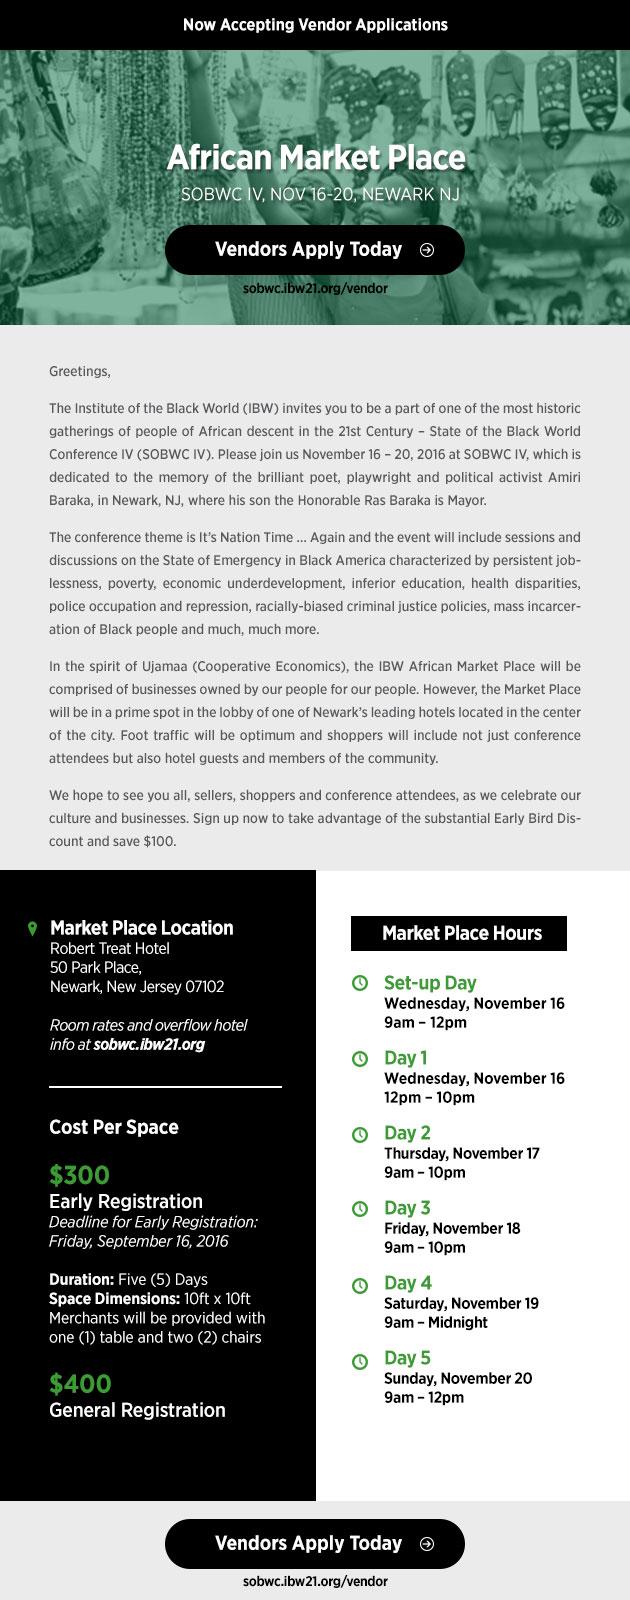 African Market Place Vendor Opportunities - SOBWC IV, Nov 16-20, 2016, Robert Treat Hotel, 50 Park Pl., Newark NJ 07102